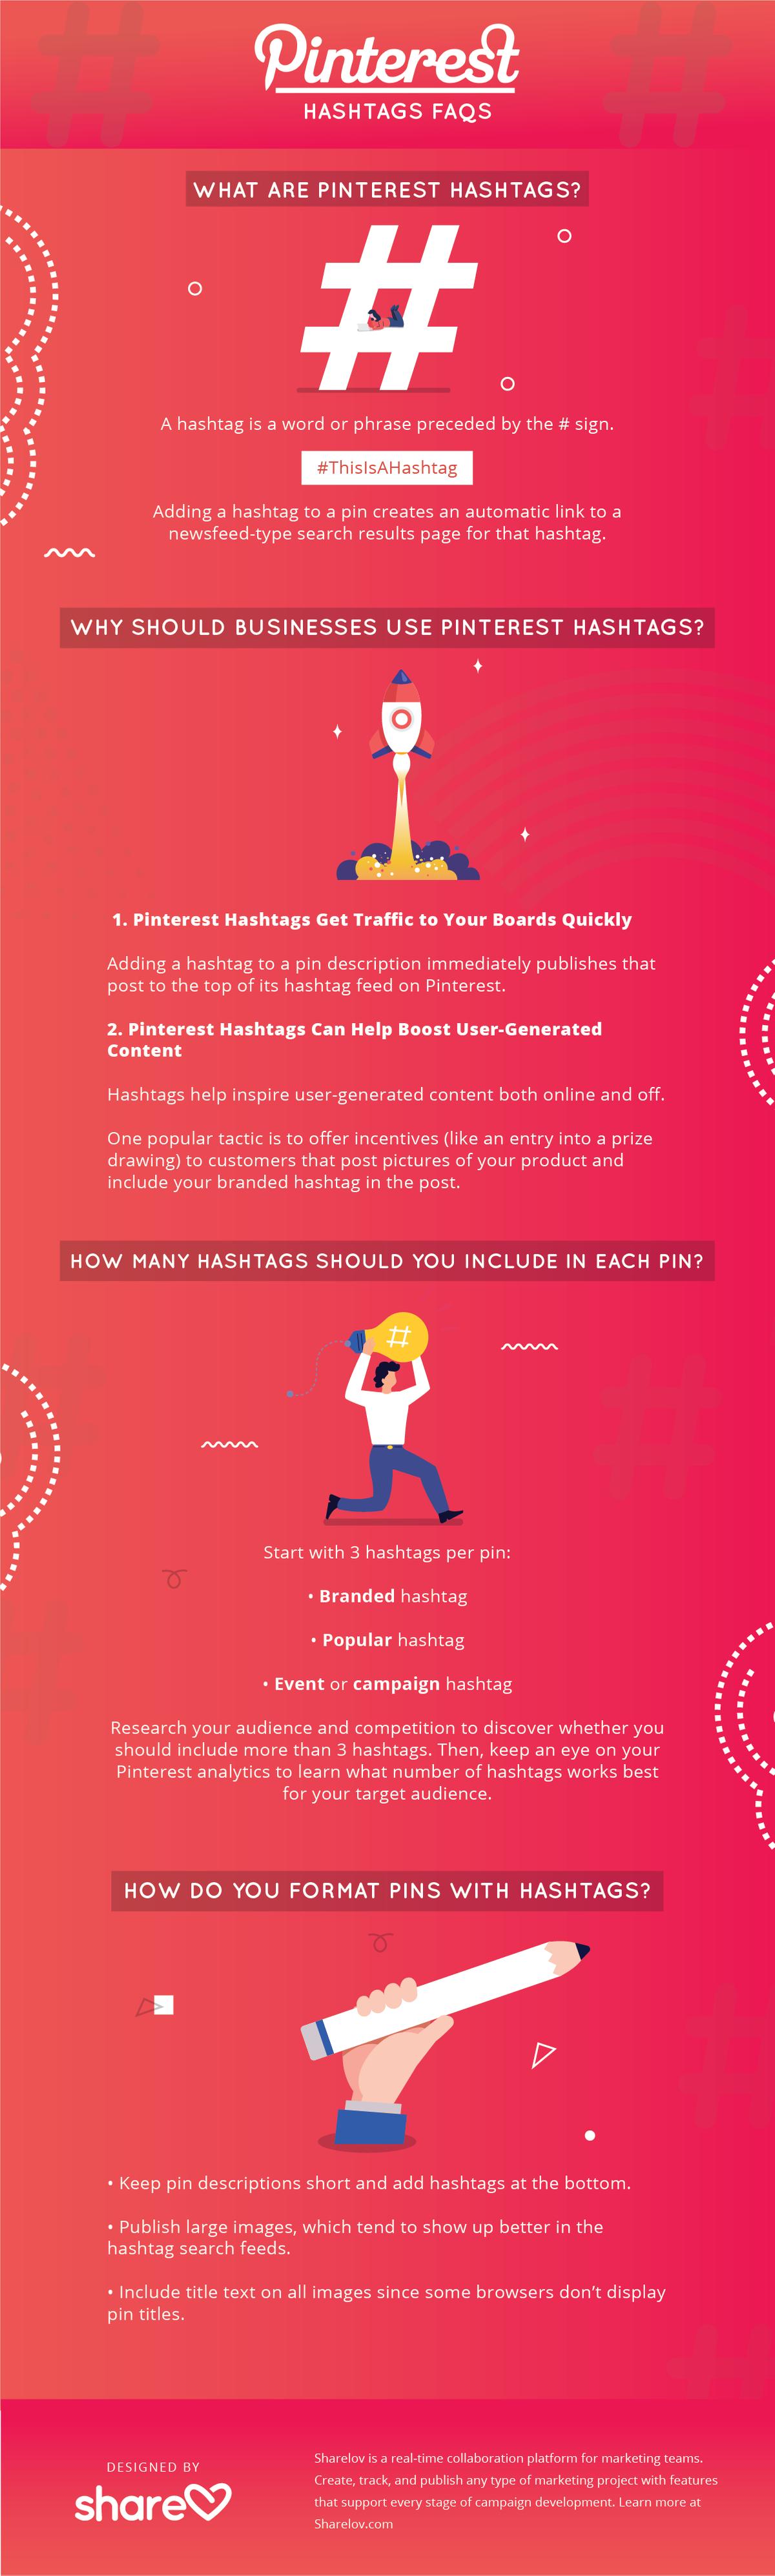 Pinterest hashtag FAQs infographic